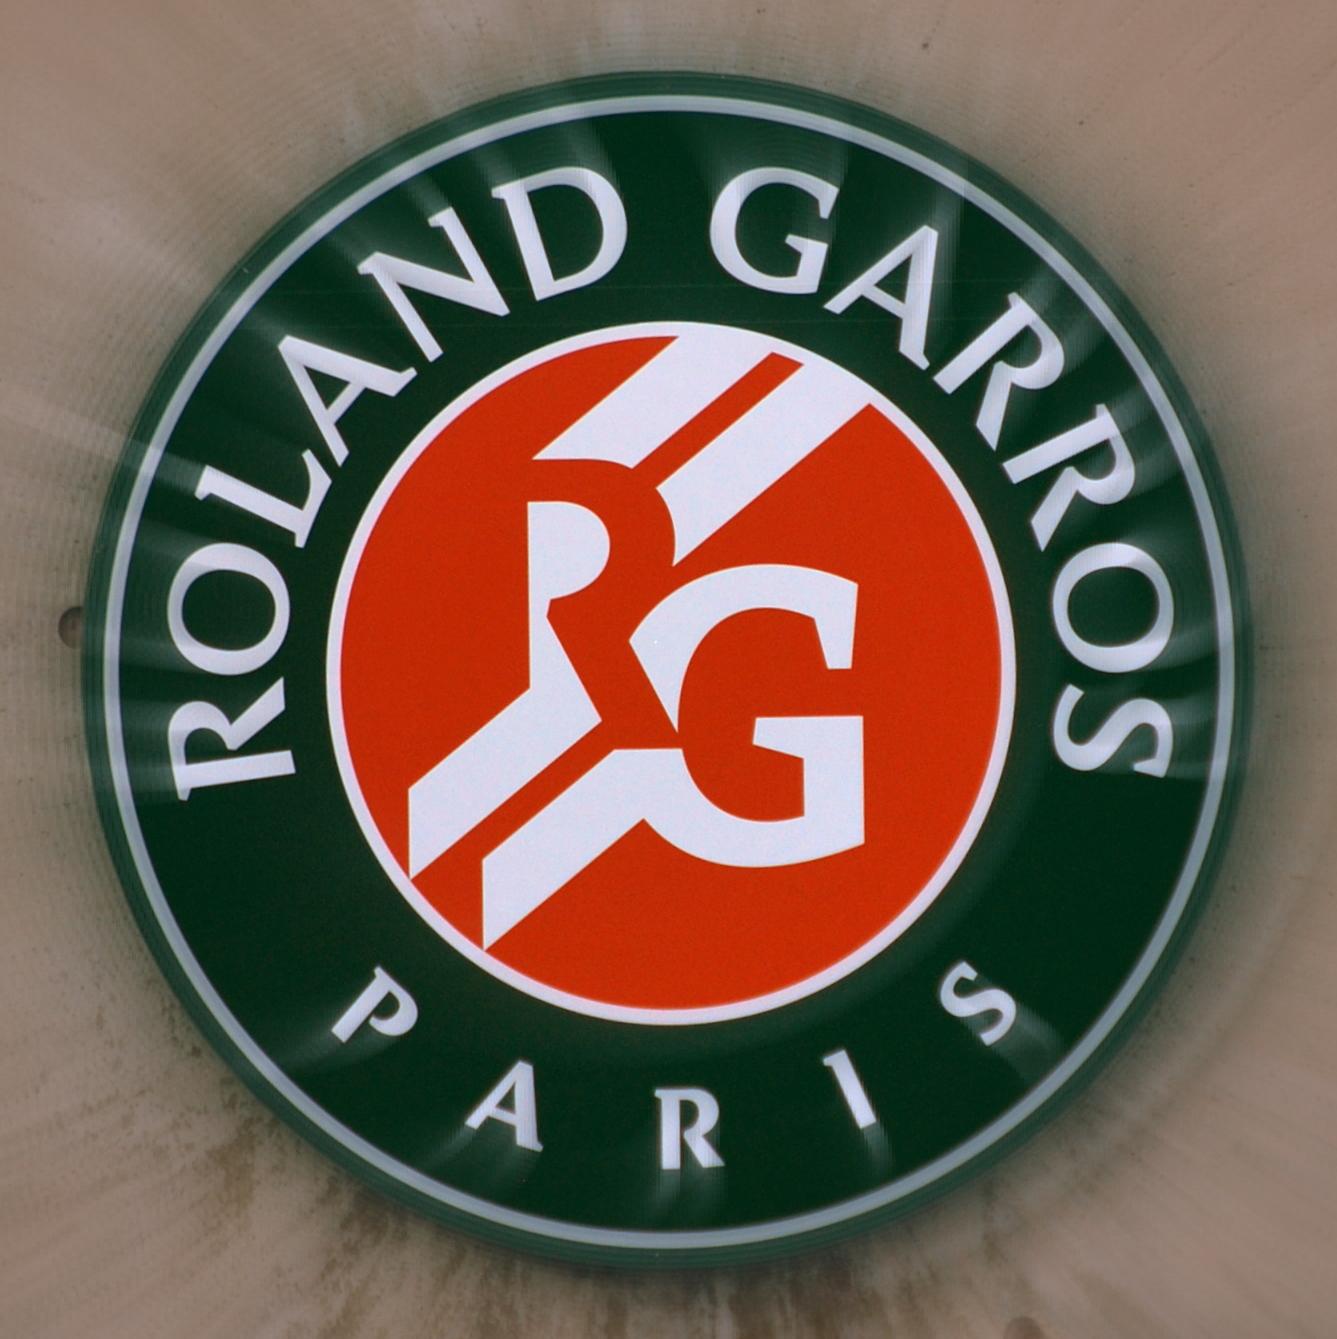 Torneo de Roland Garros - Wikipedia, la enciclopedia libre